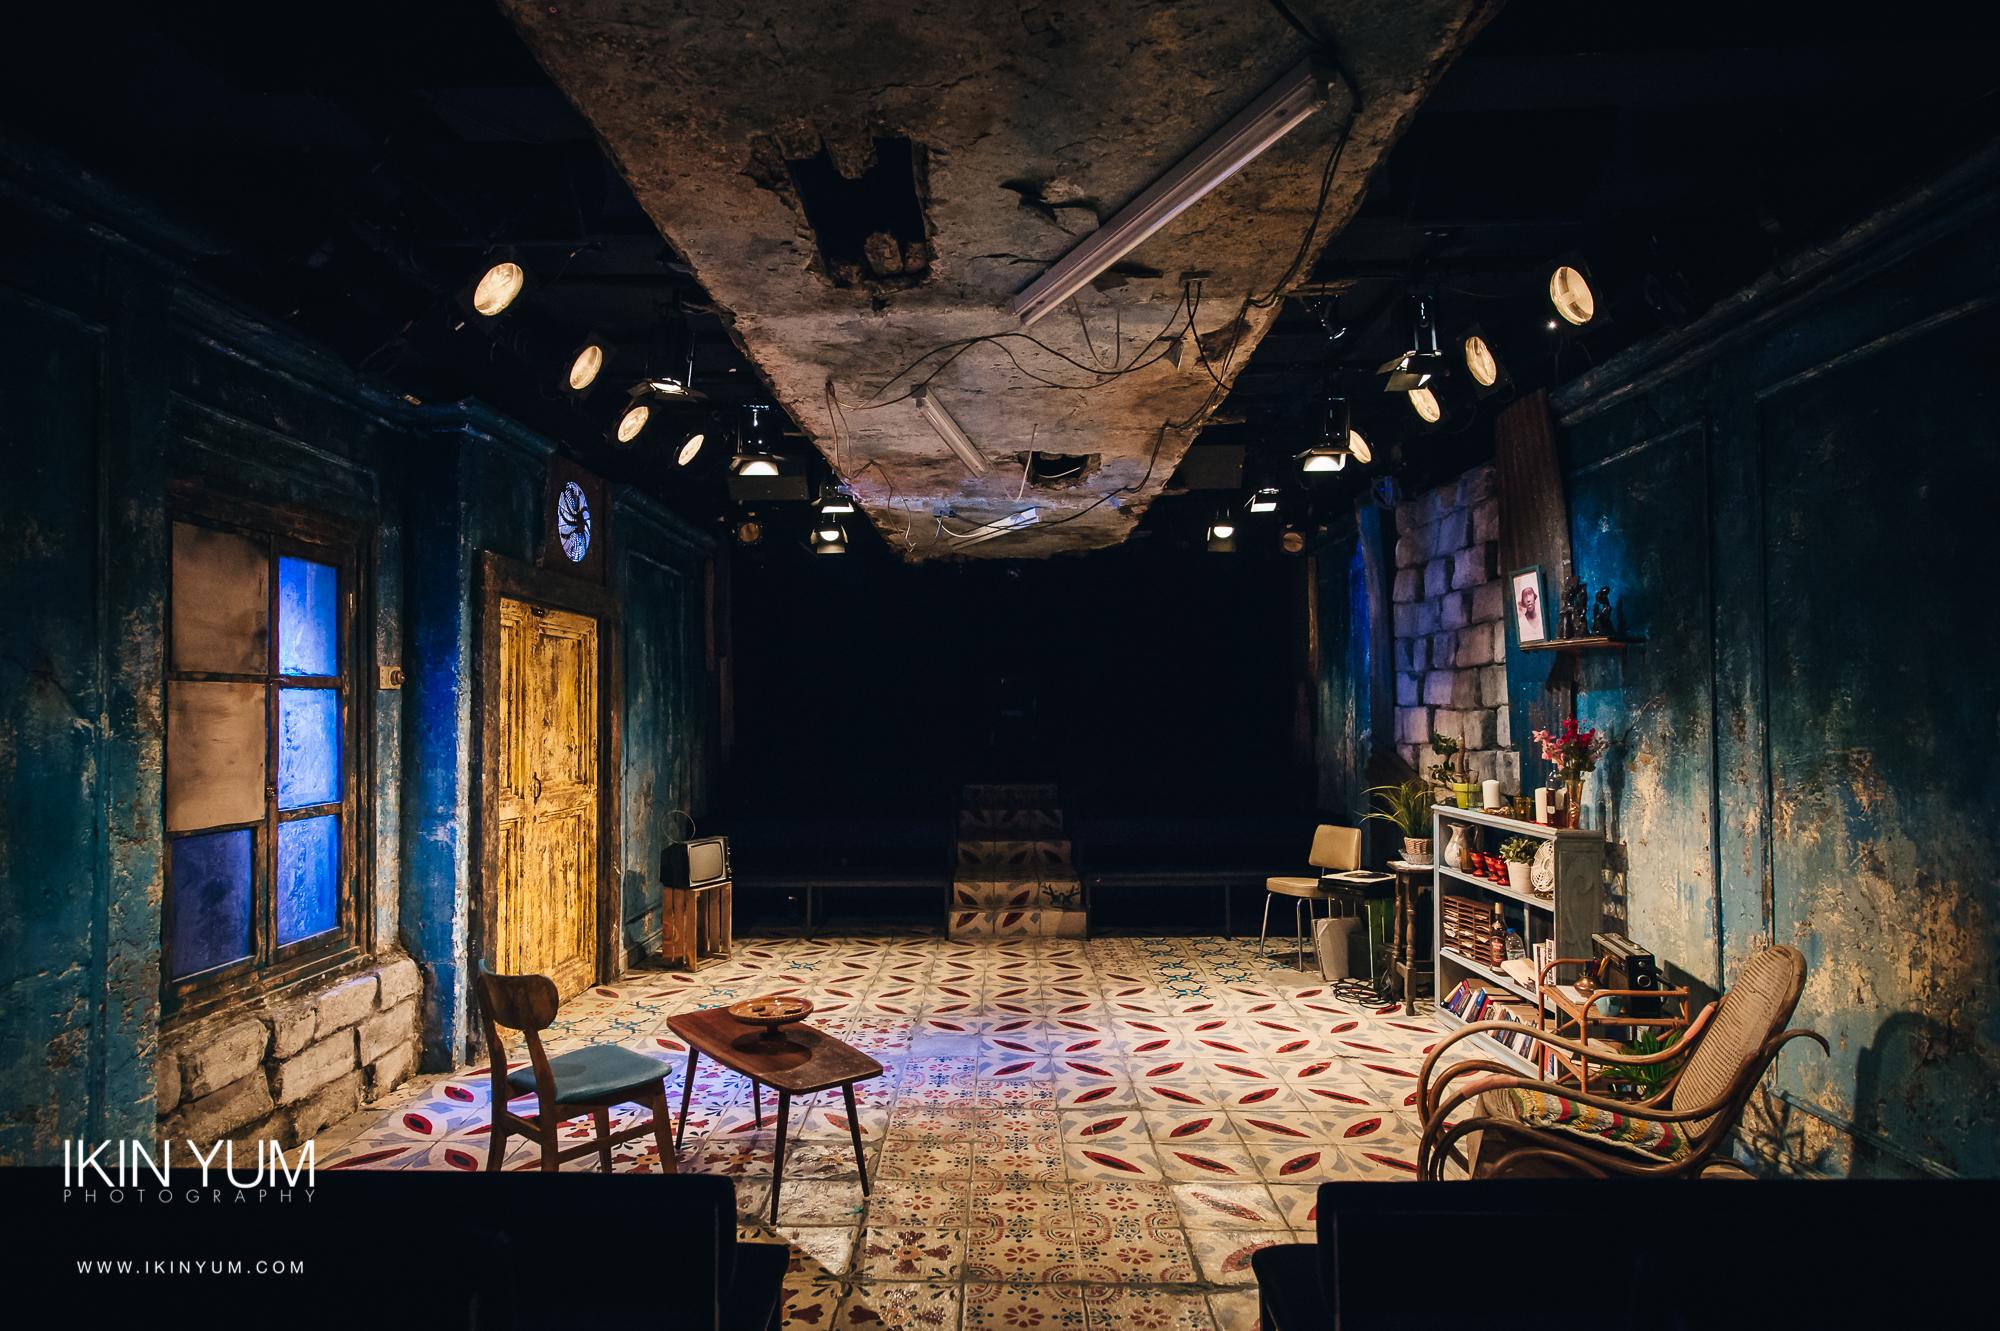 Assata Taught Me - Gate Theatre - Ikin Yum Photography-218.jpg